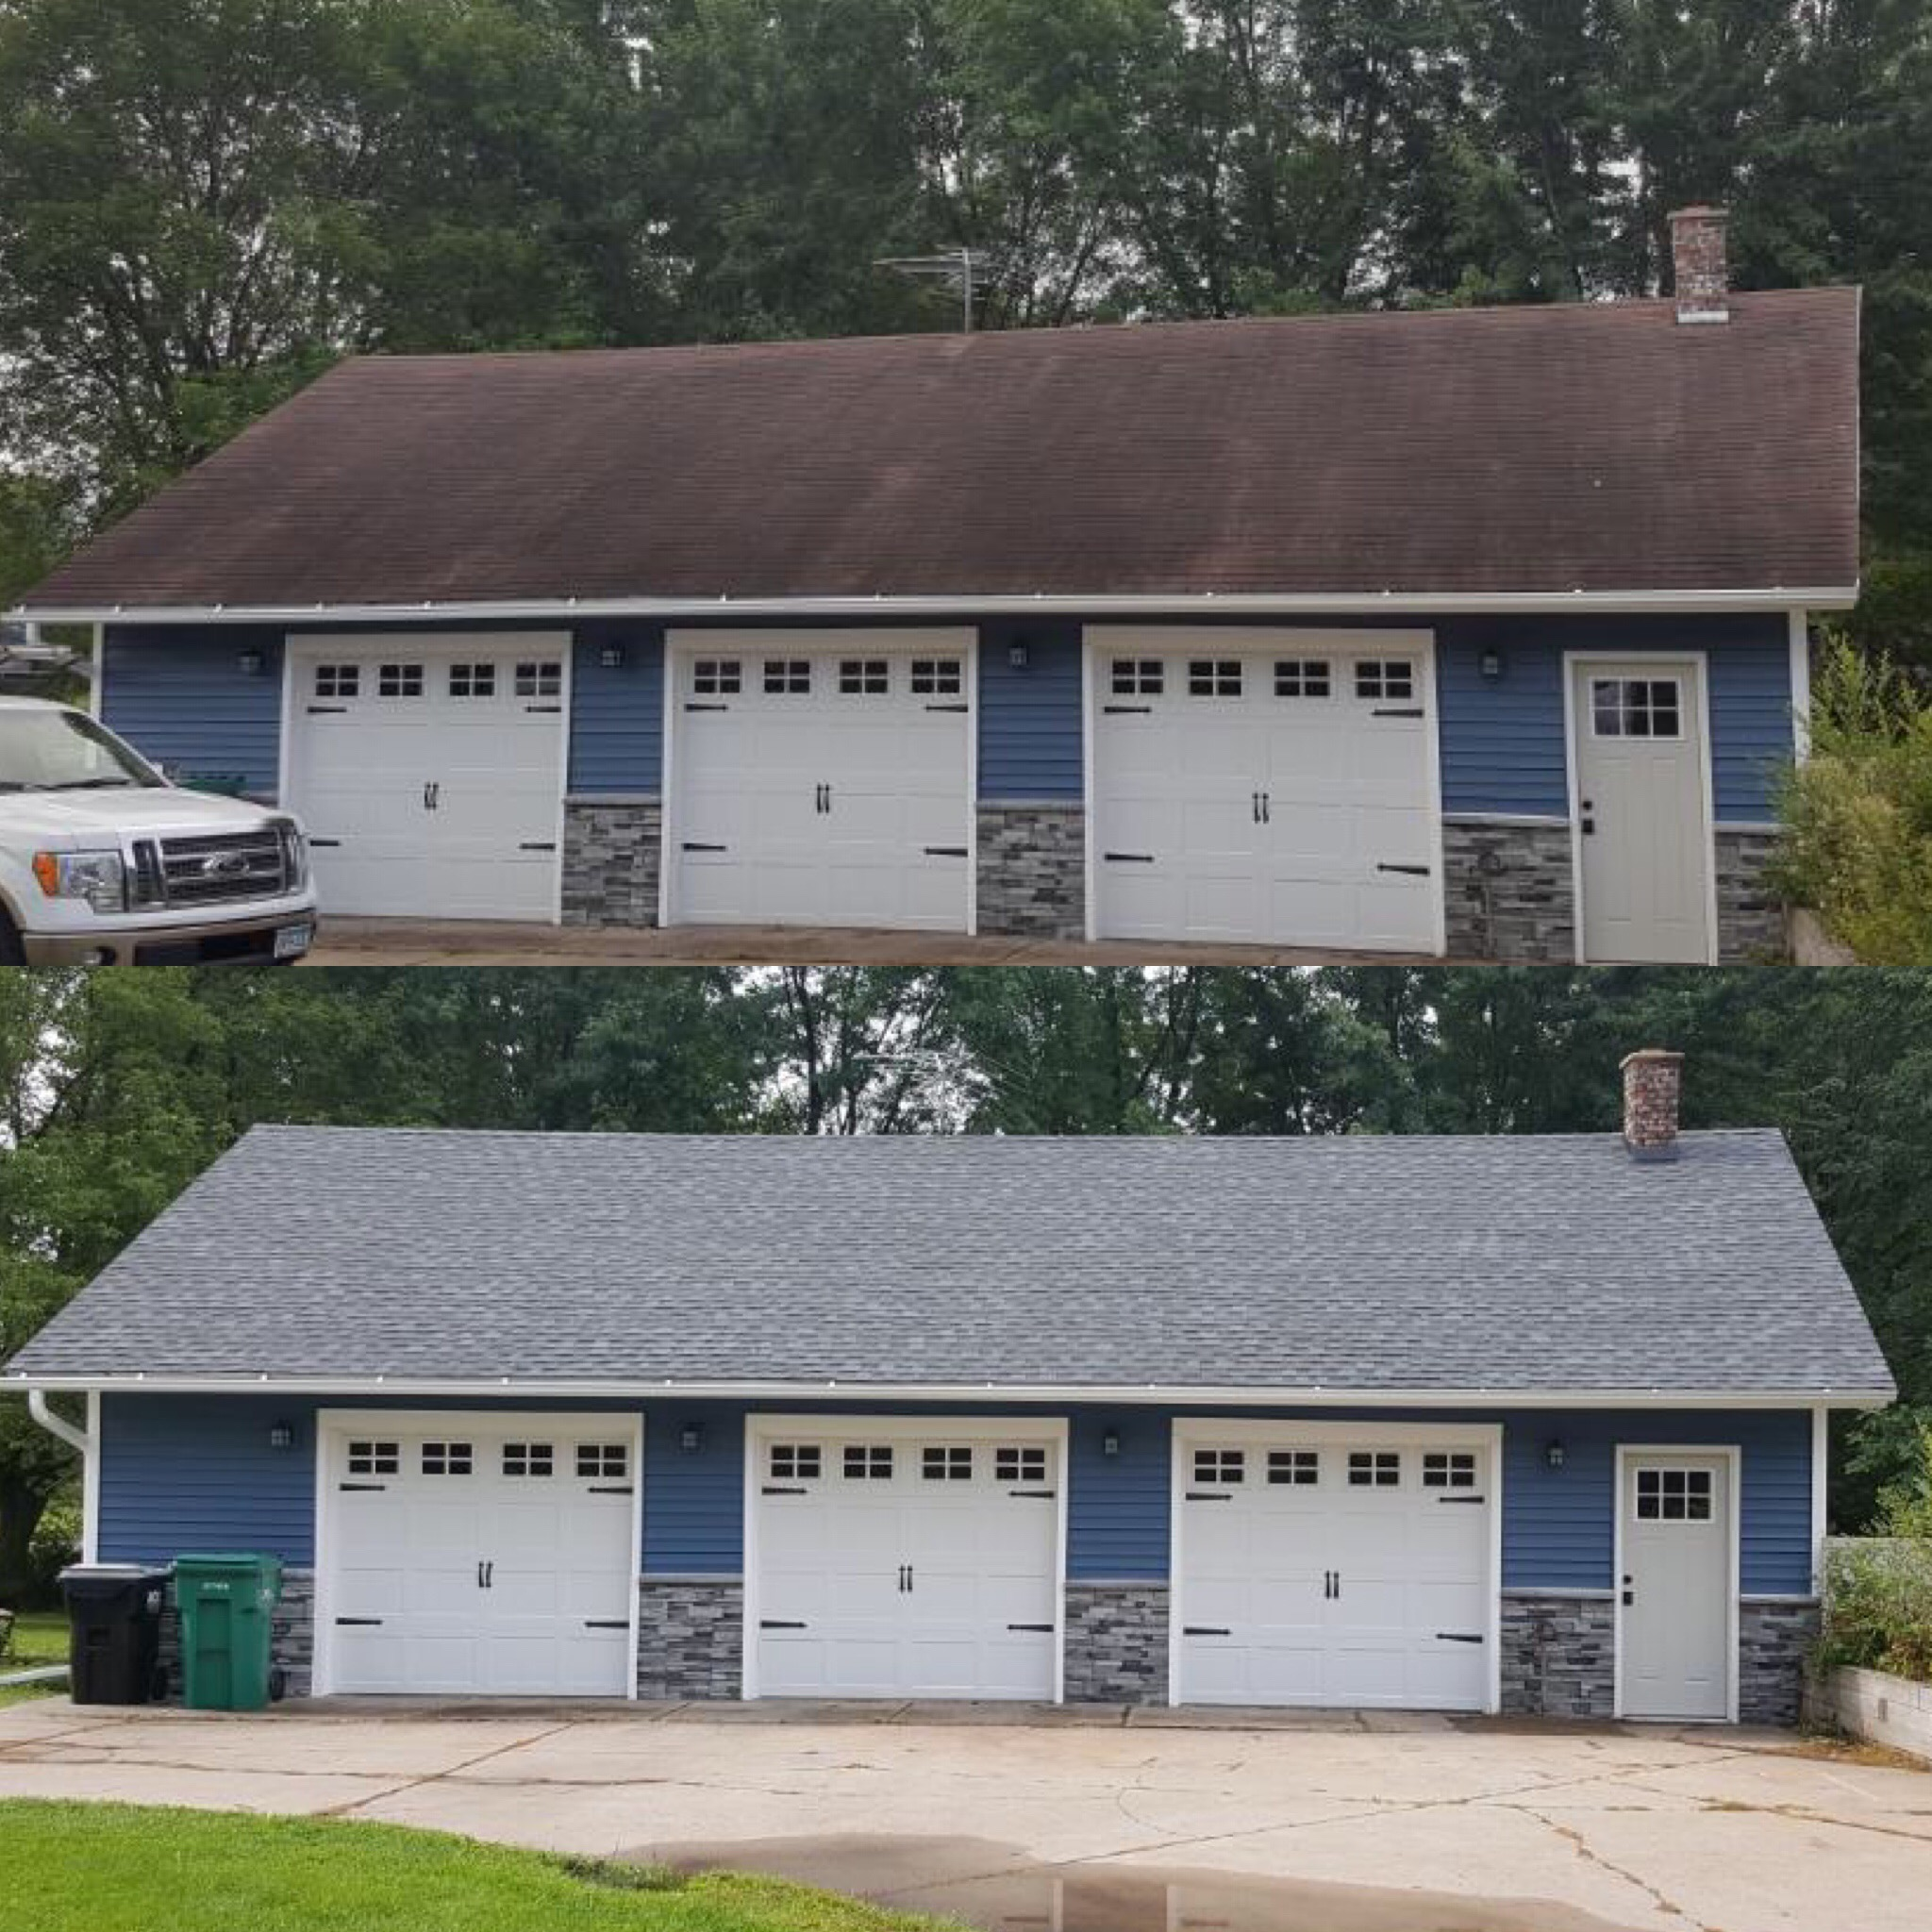 New Garage Roof August 2019